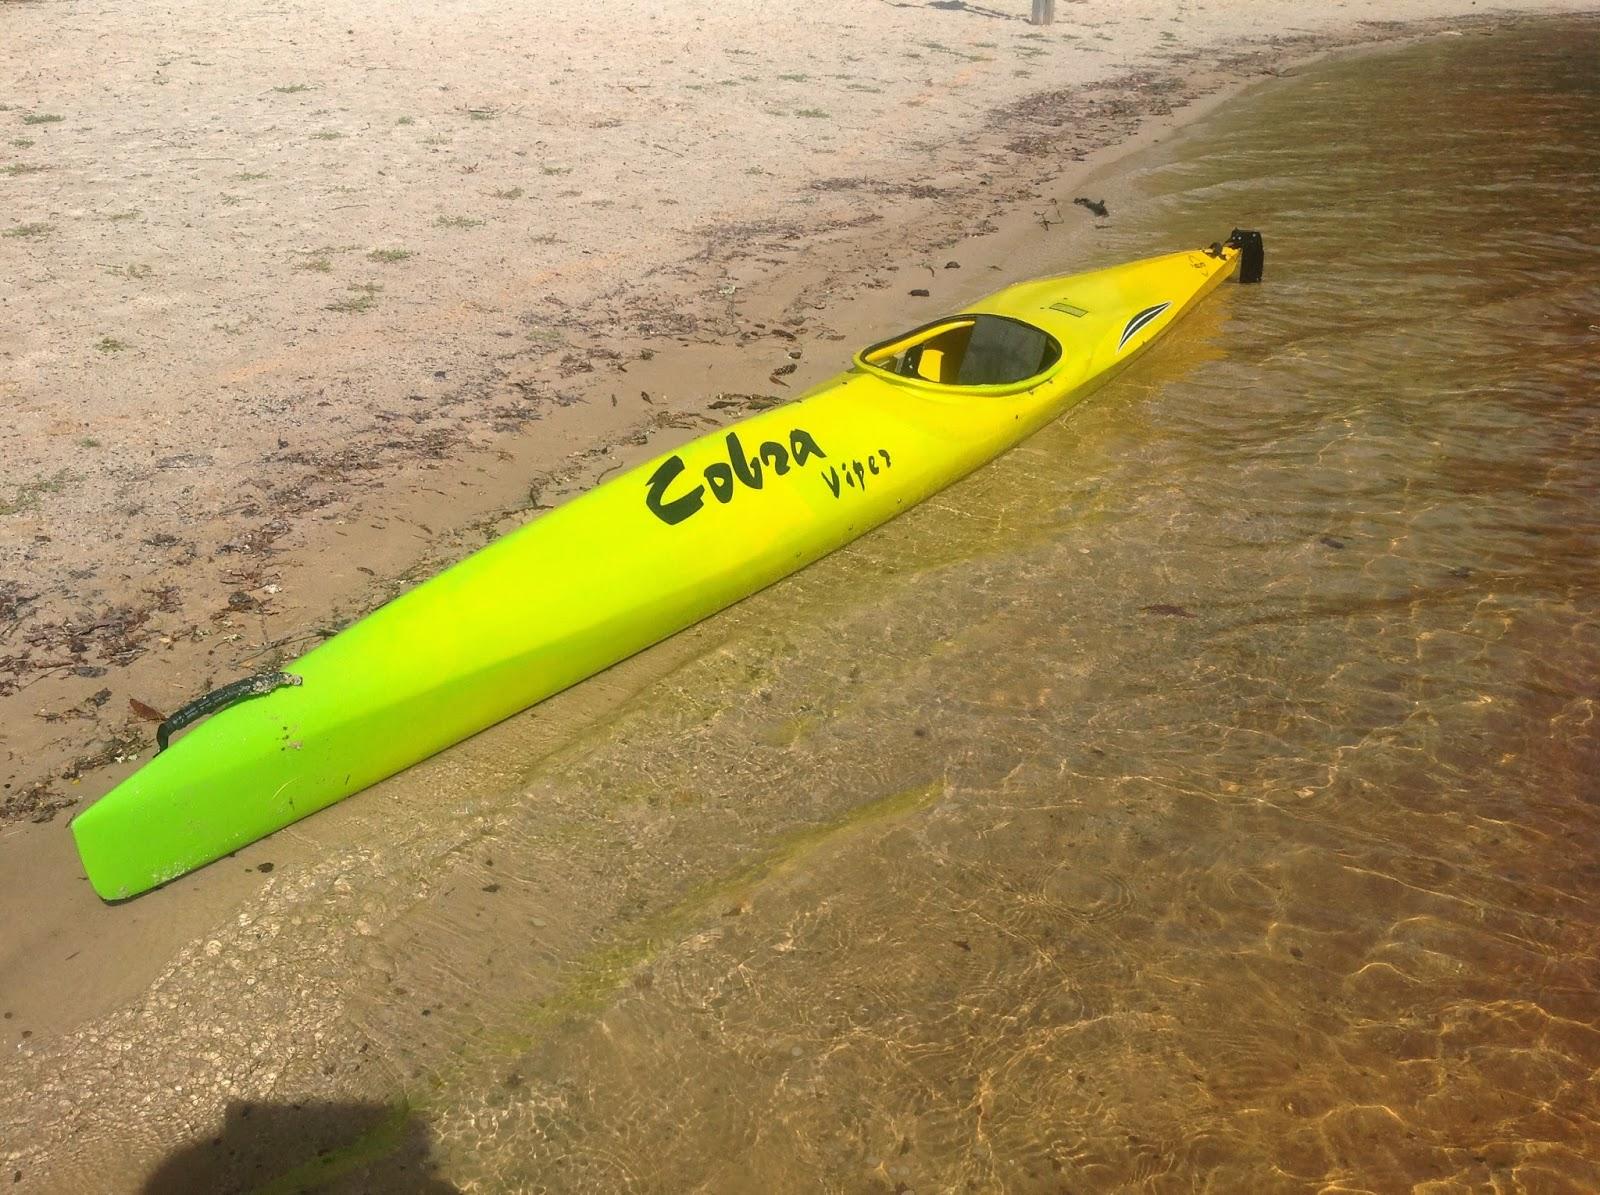 Runalleghany Cobra Viper Racing Kayak For Sale